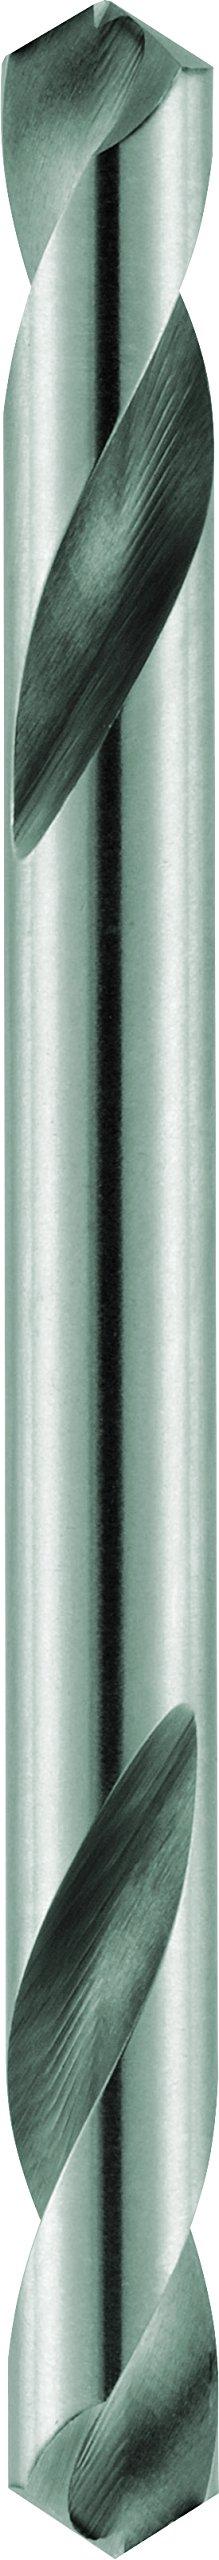 Alpen 37100490100 HSS Stub Drills For Rivets''Super'' Din 1897 Ded-K 4, 9mm